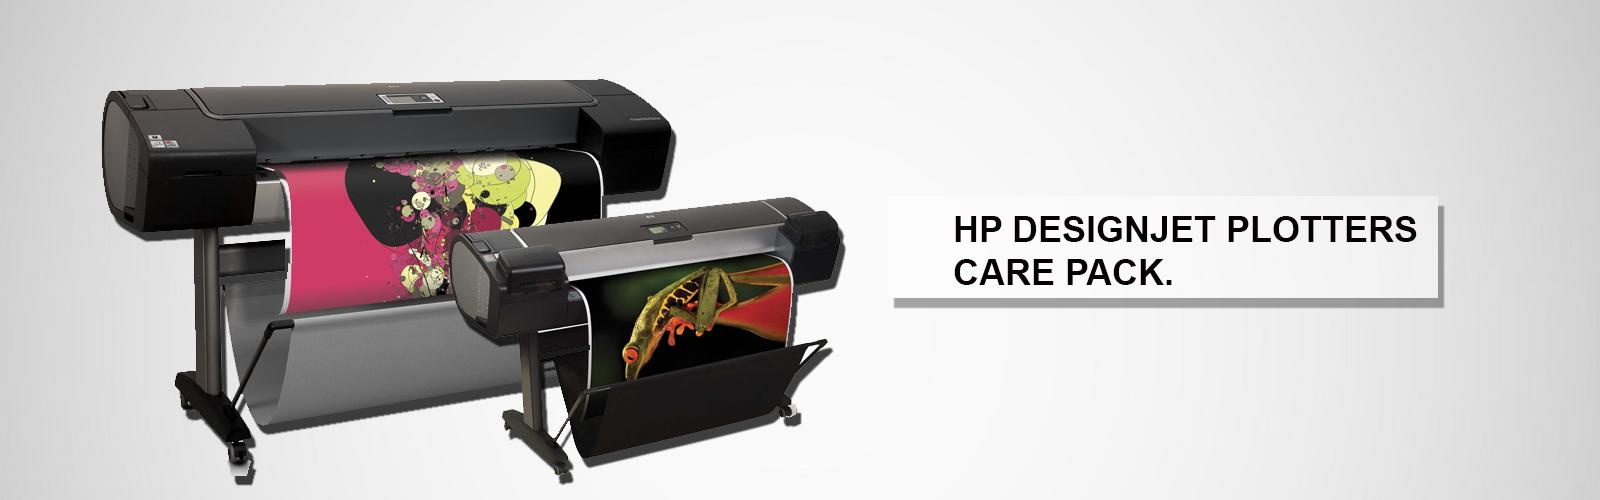 HP Designjet Plotters Care Pack Delhi